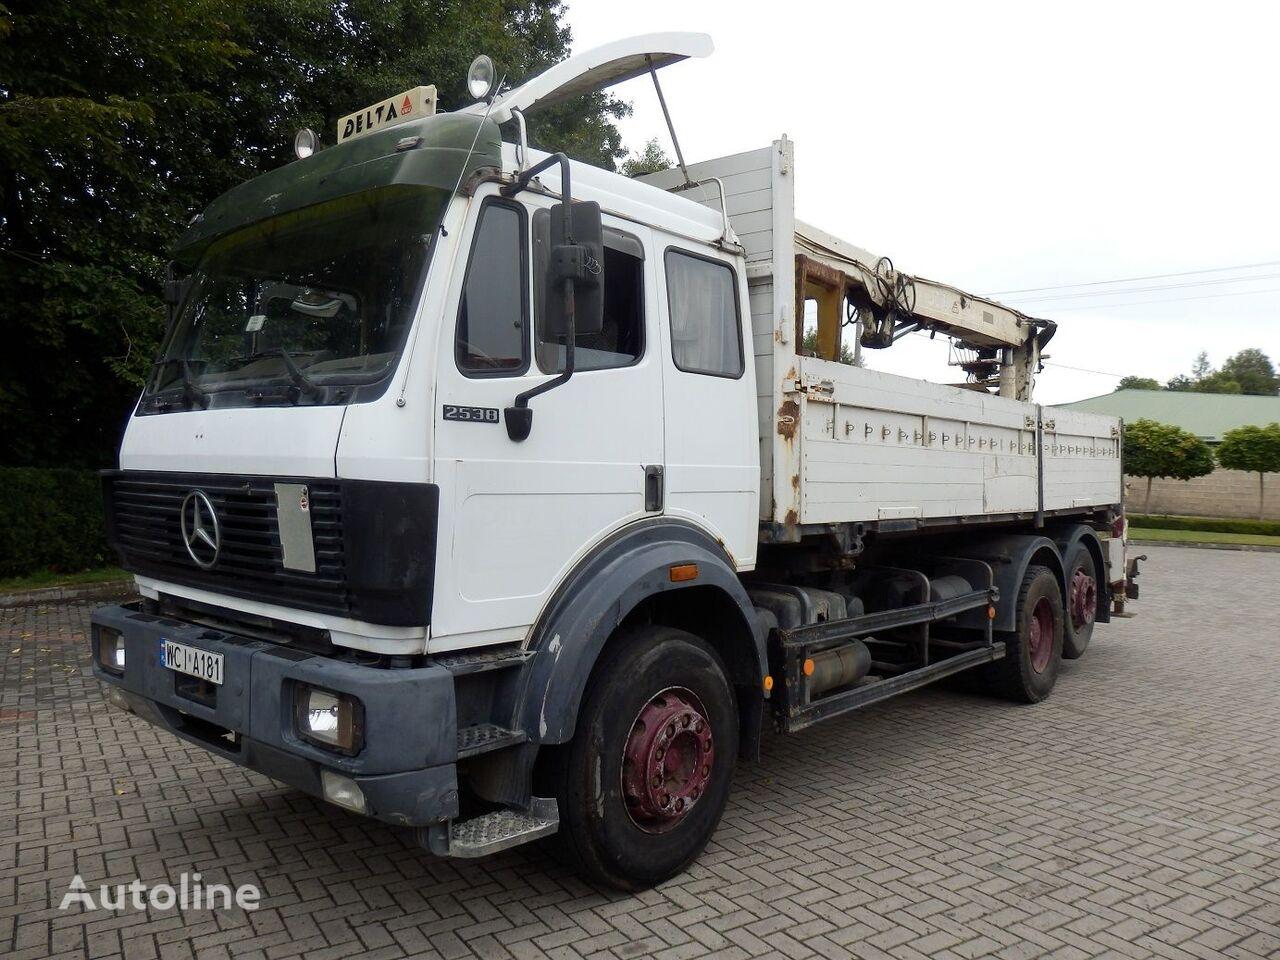 MERCEDES-BENZ SK 2538 6x2 Engine V8 13.t Axles  kamion s ravnom platformom